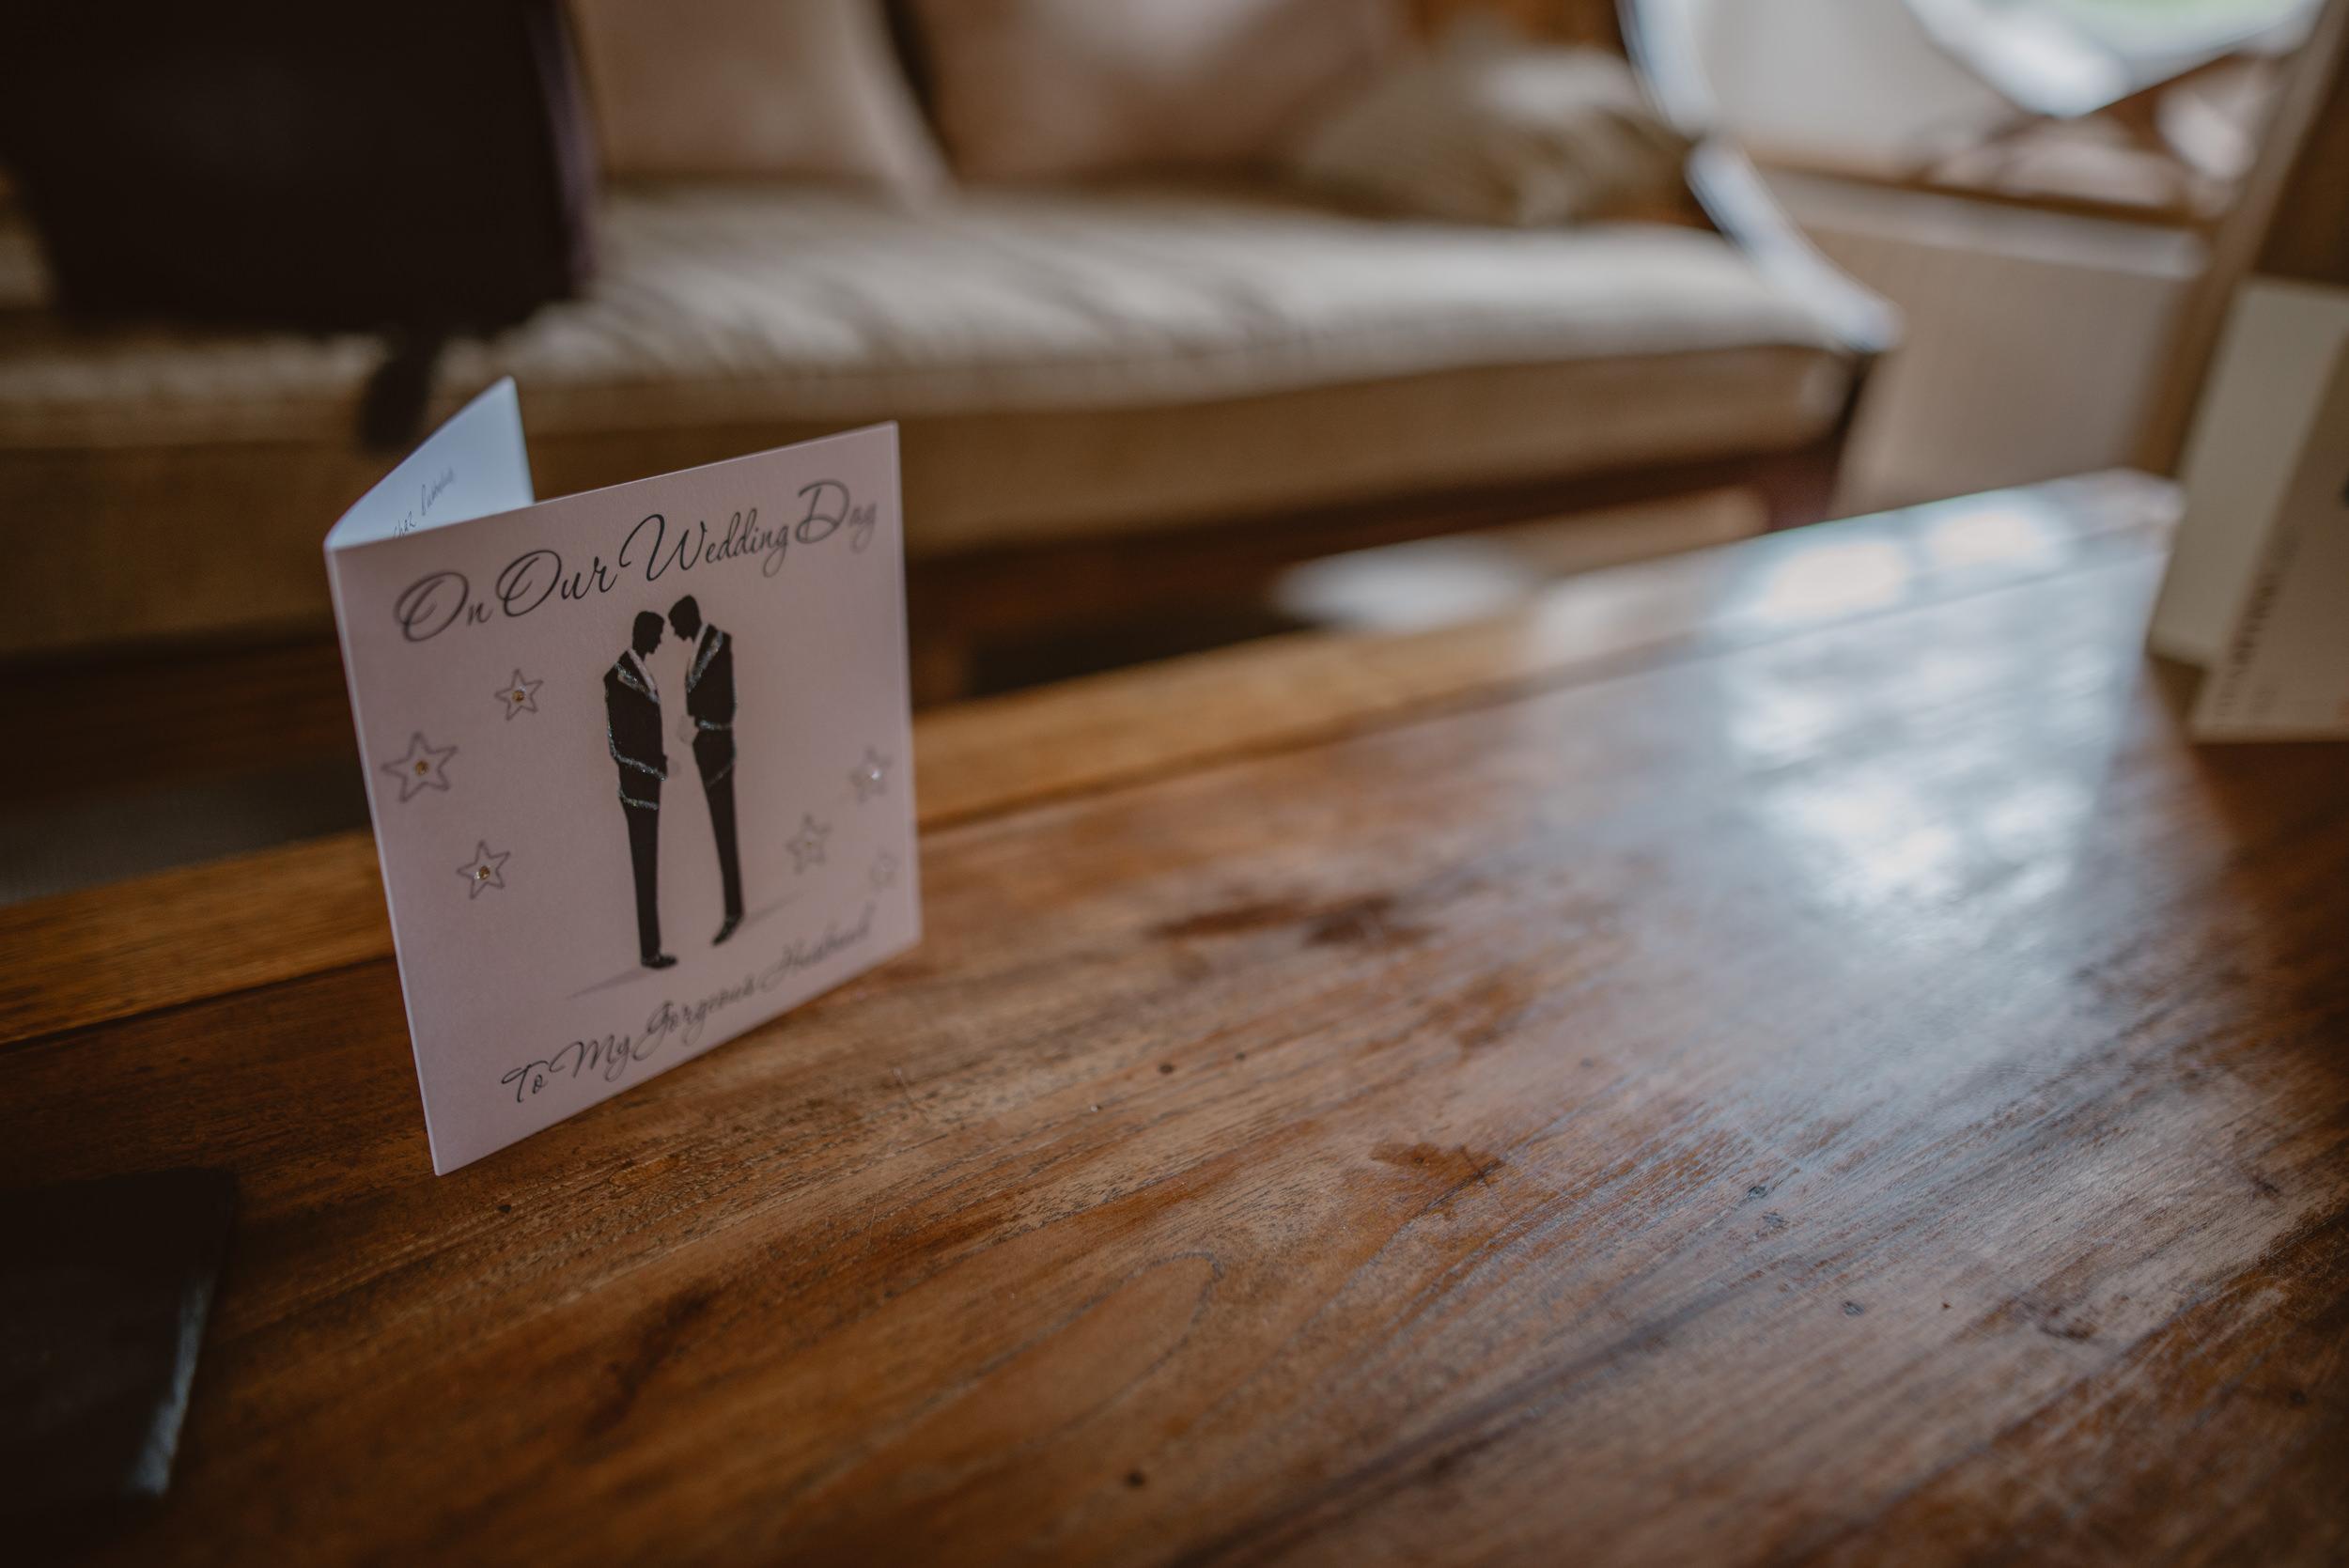 Barry-and-Chaz-wedding-Wasing-Park-Berkshire-Manu-Mendoza-Wedding-Photography-133.jpg